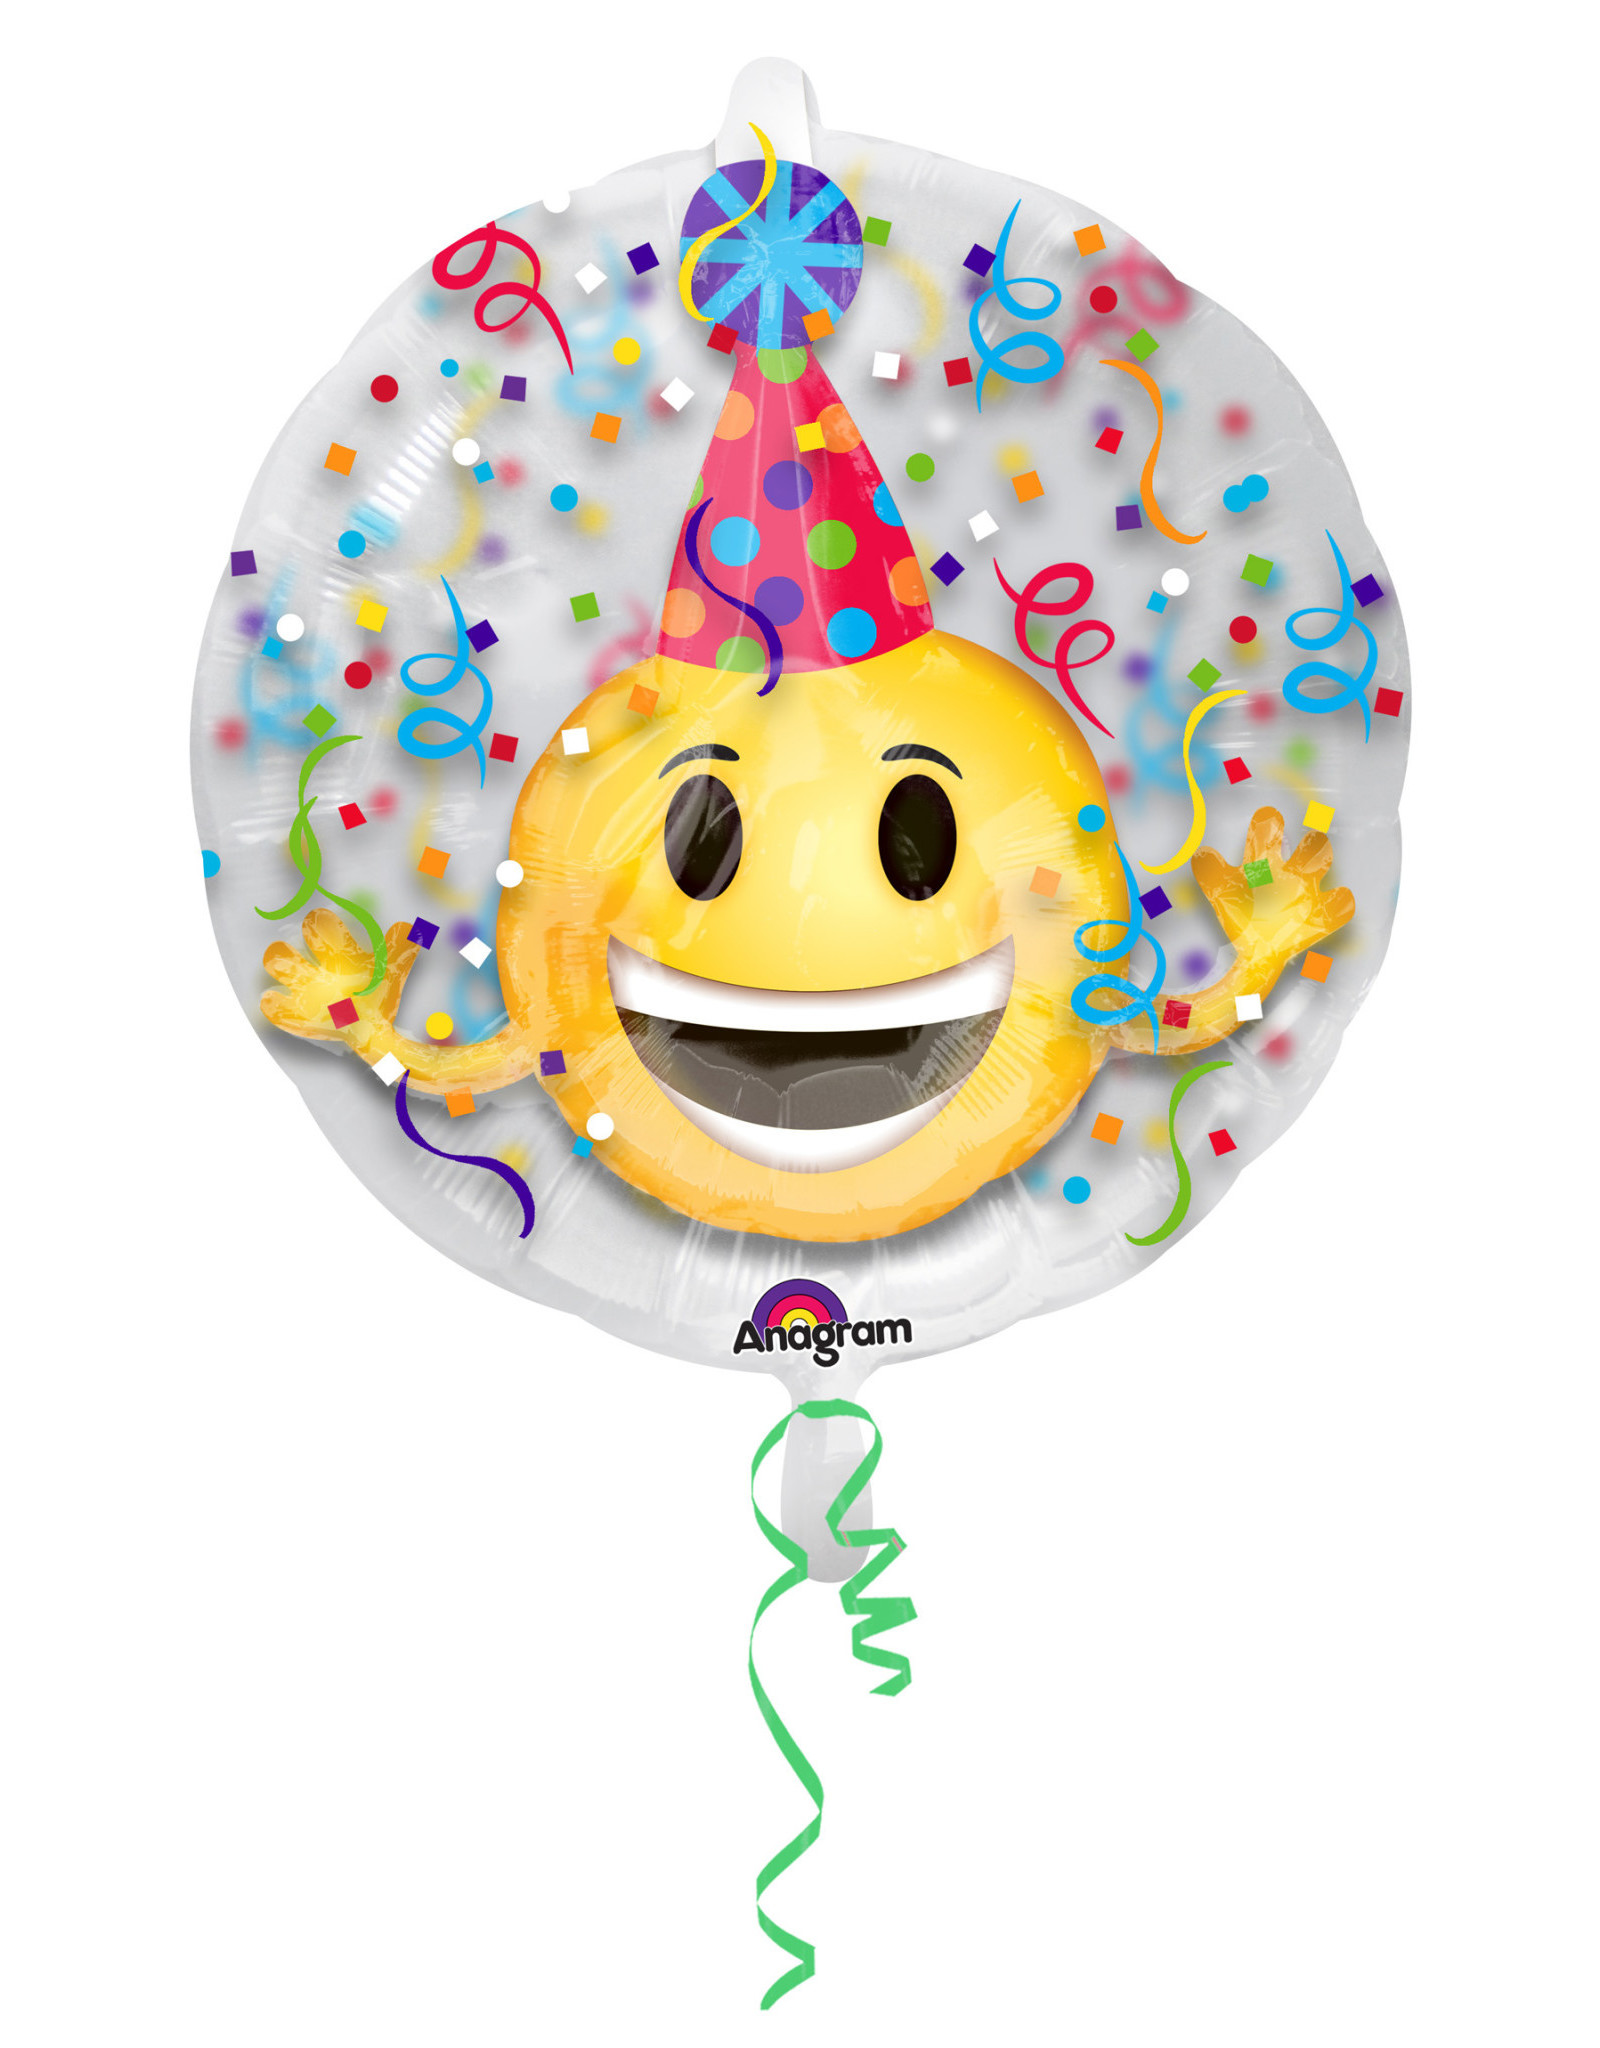 Amscan insiders folieballon emoticon party hat 60 cm